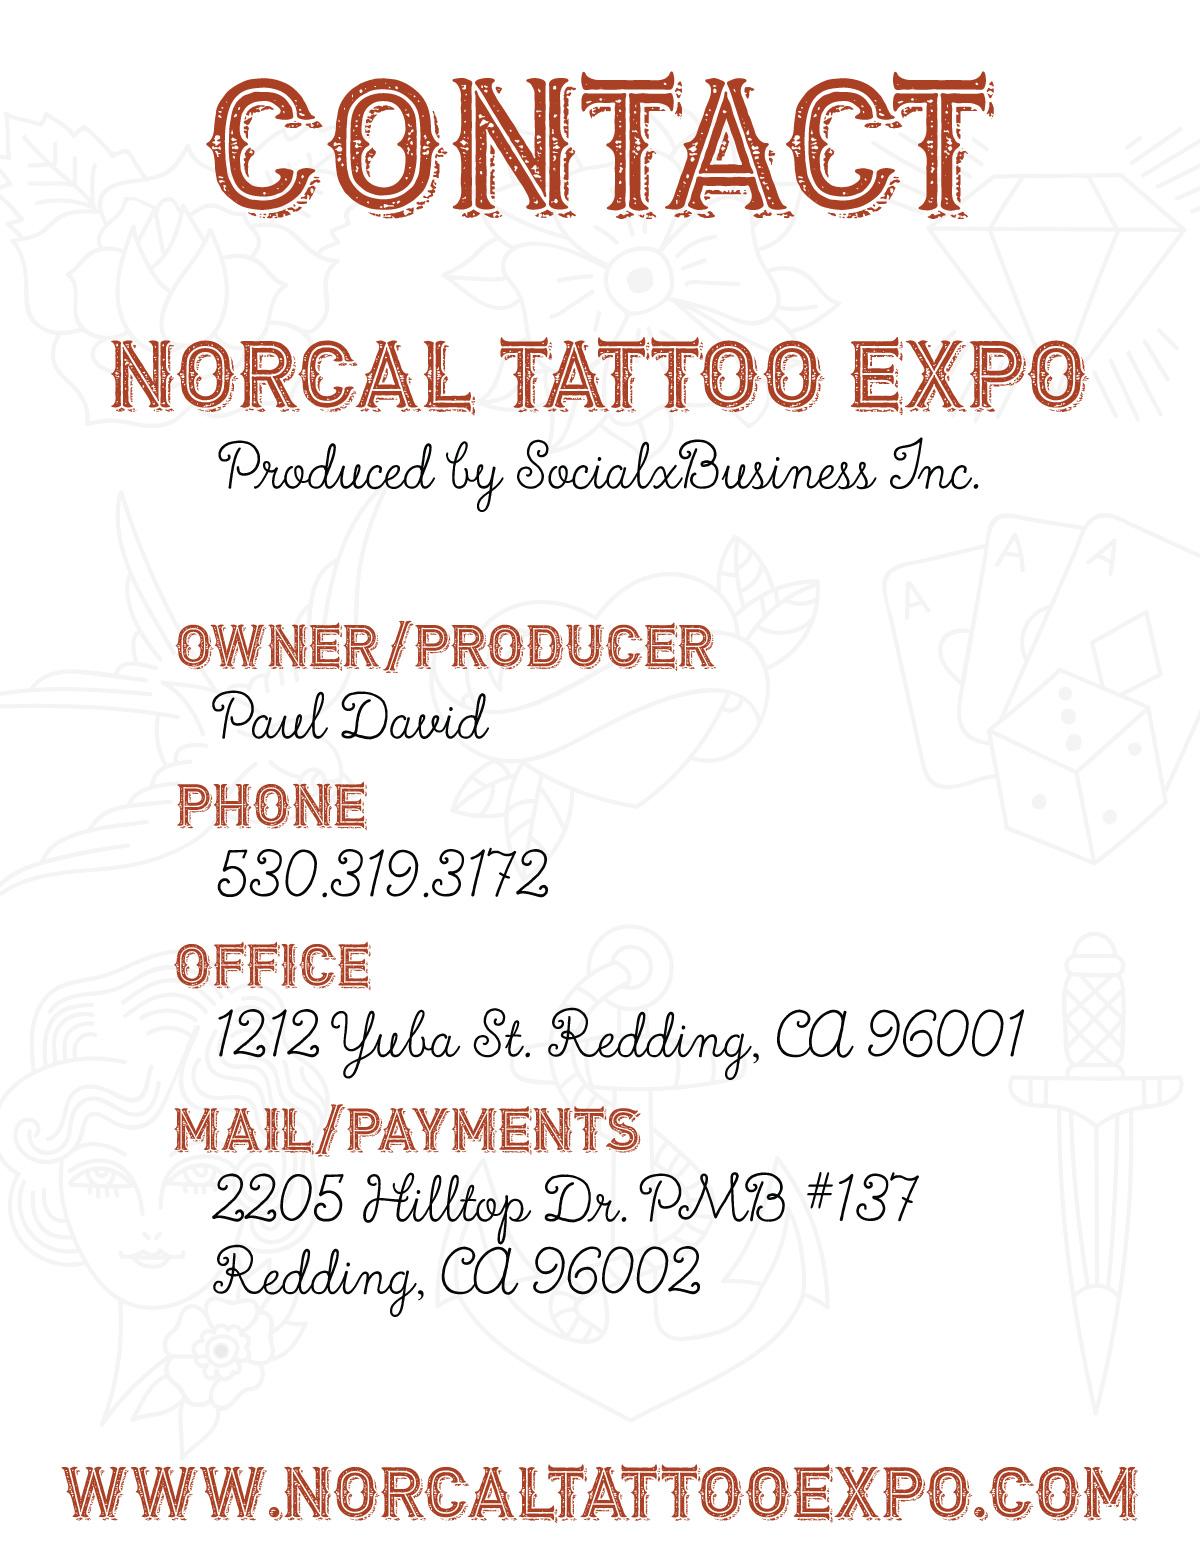 NorCal Tattoo Expo Redding CA.jpg